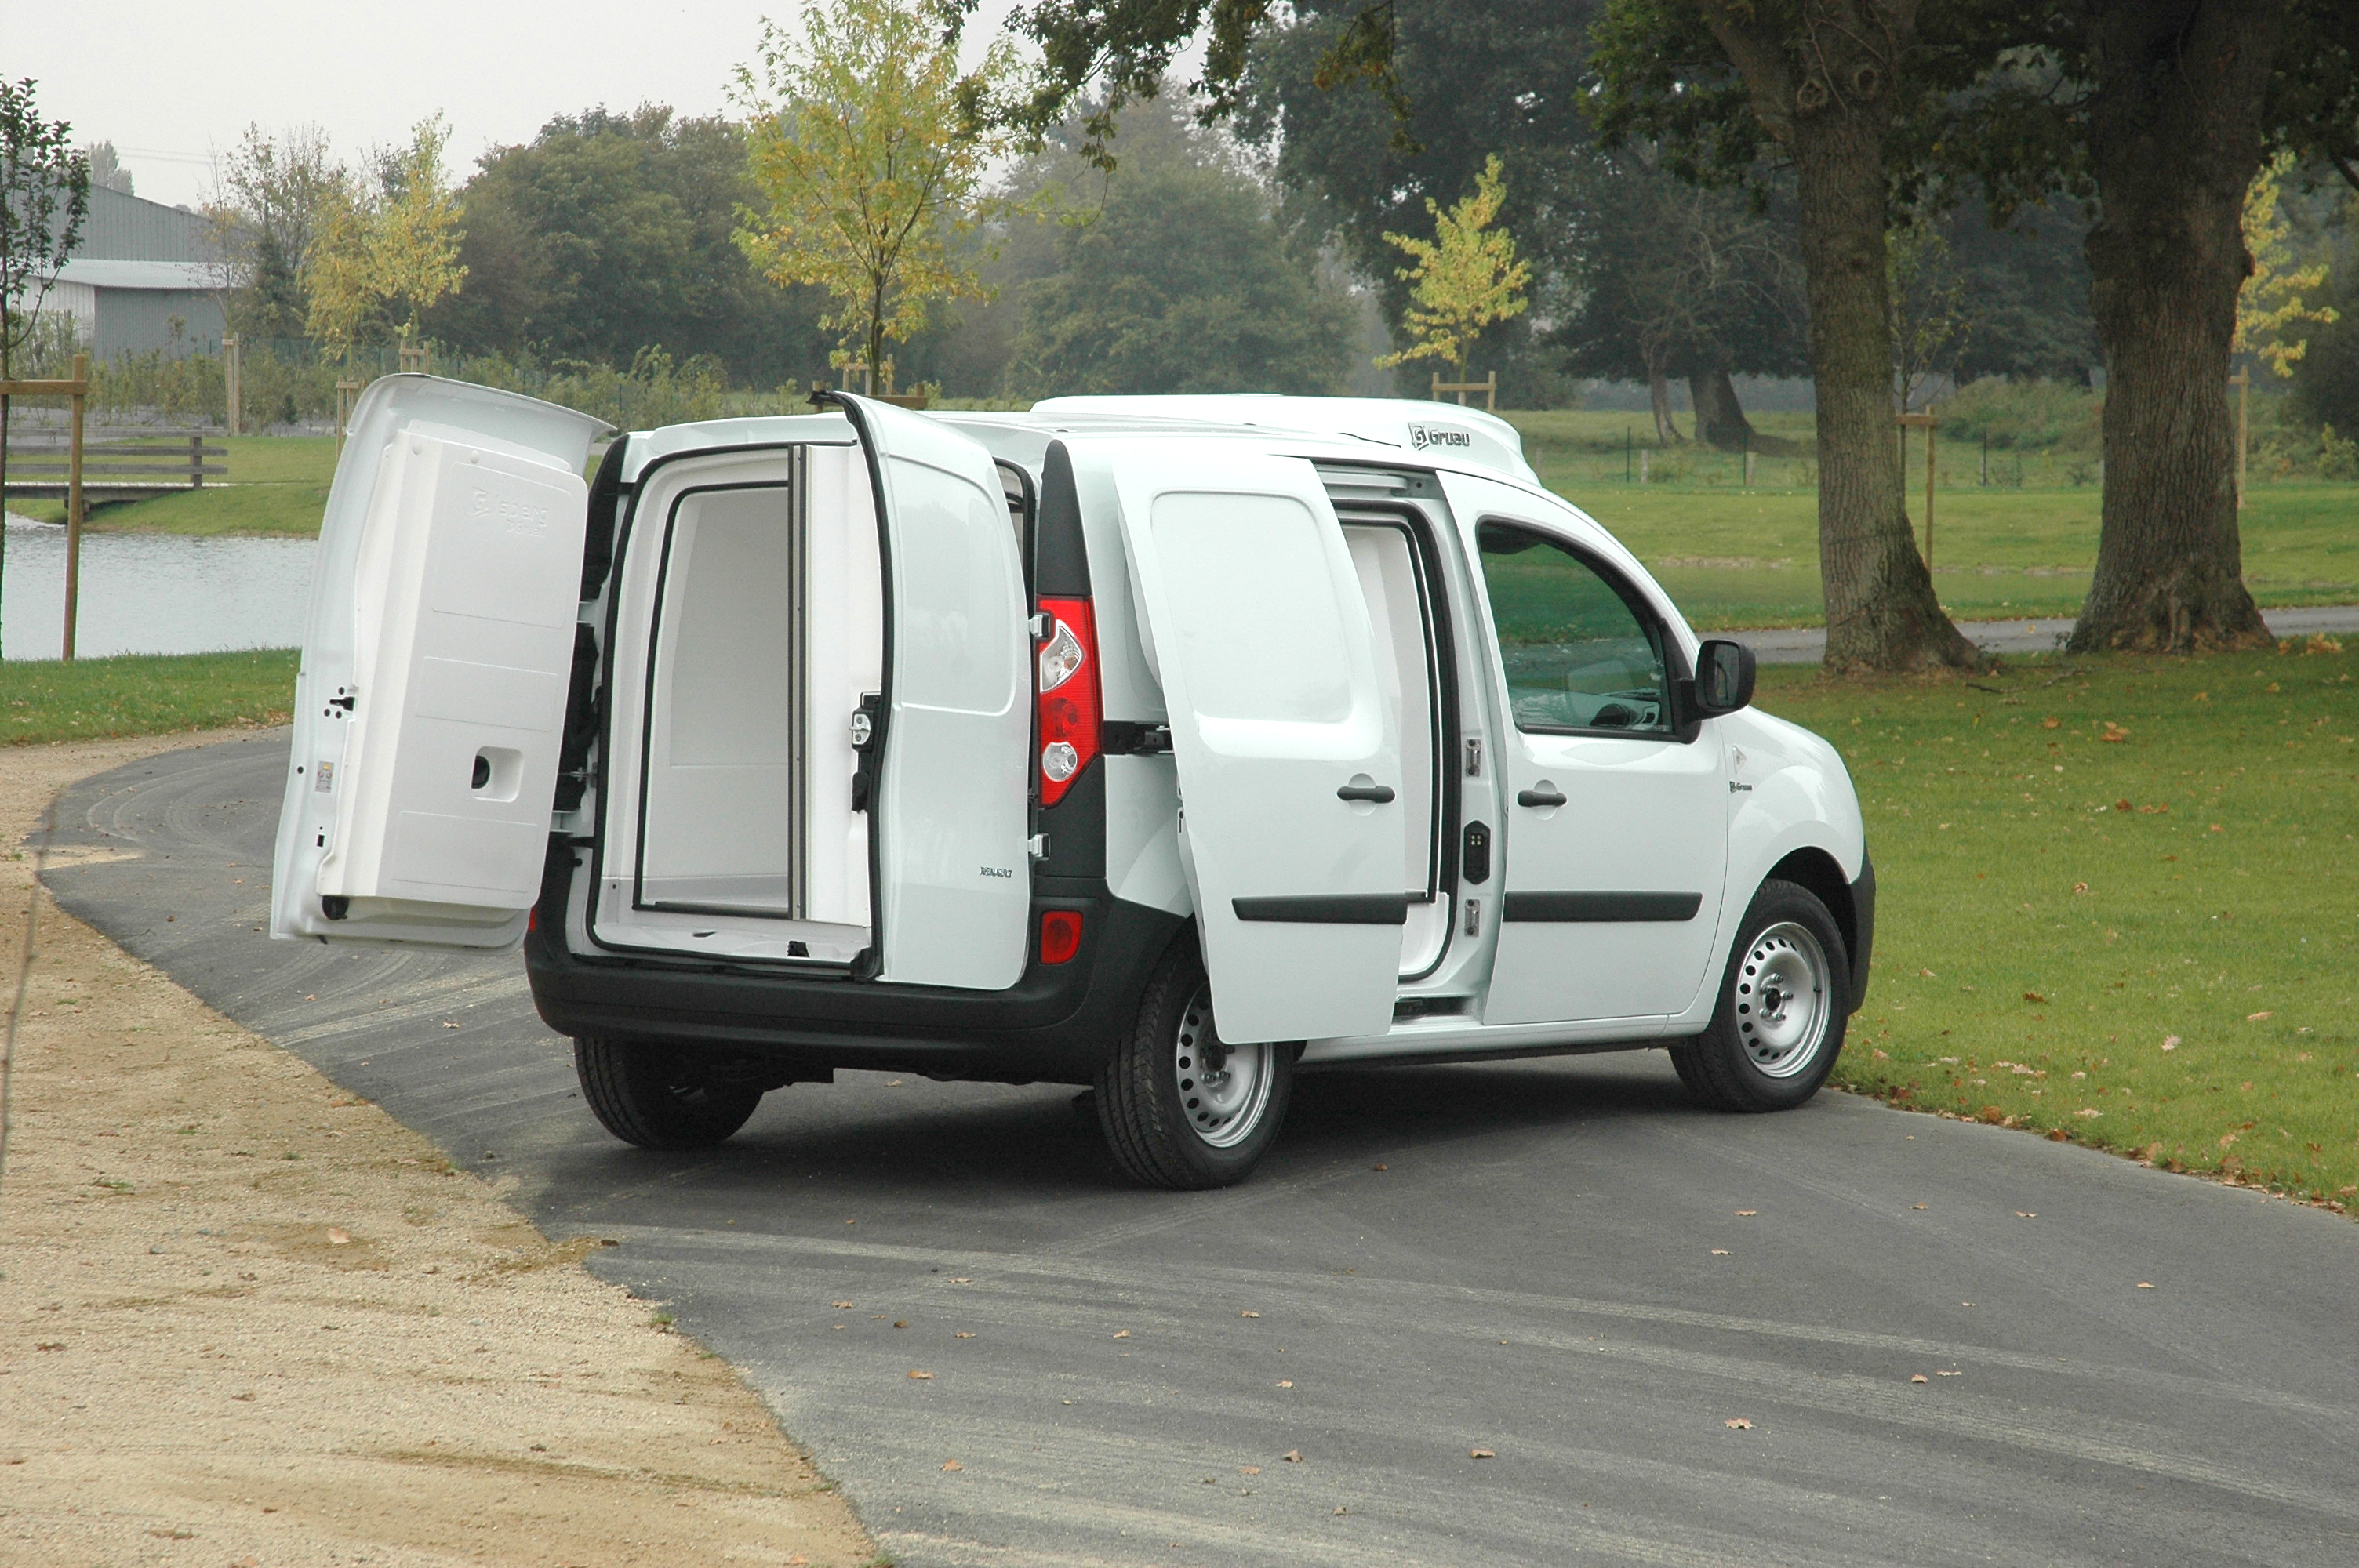 utilitaire renault d 39 occasion 37939 kilom tres diesel v hicule isotherme frigorifique pas. Black Bedroom Furniture Sets. Home Design Ideas